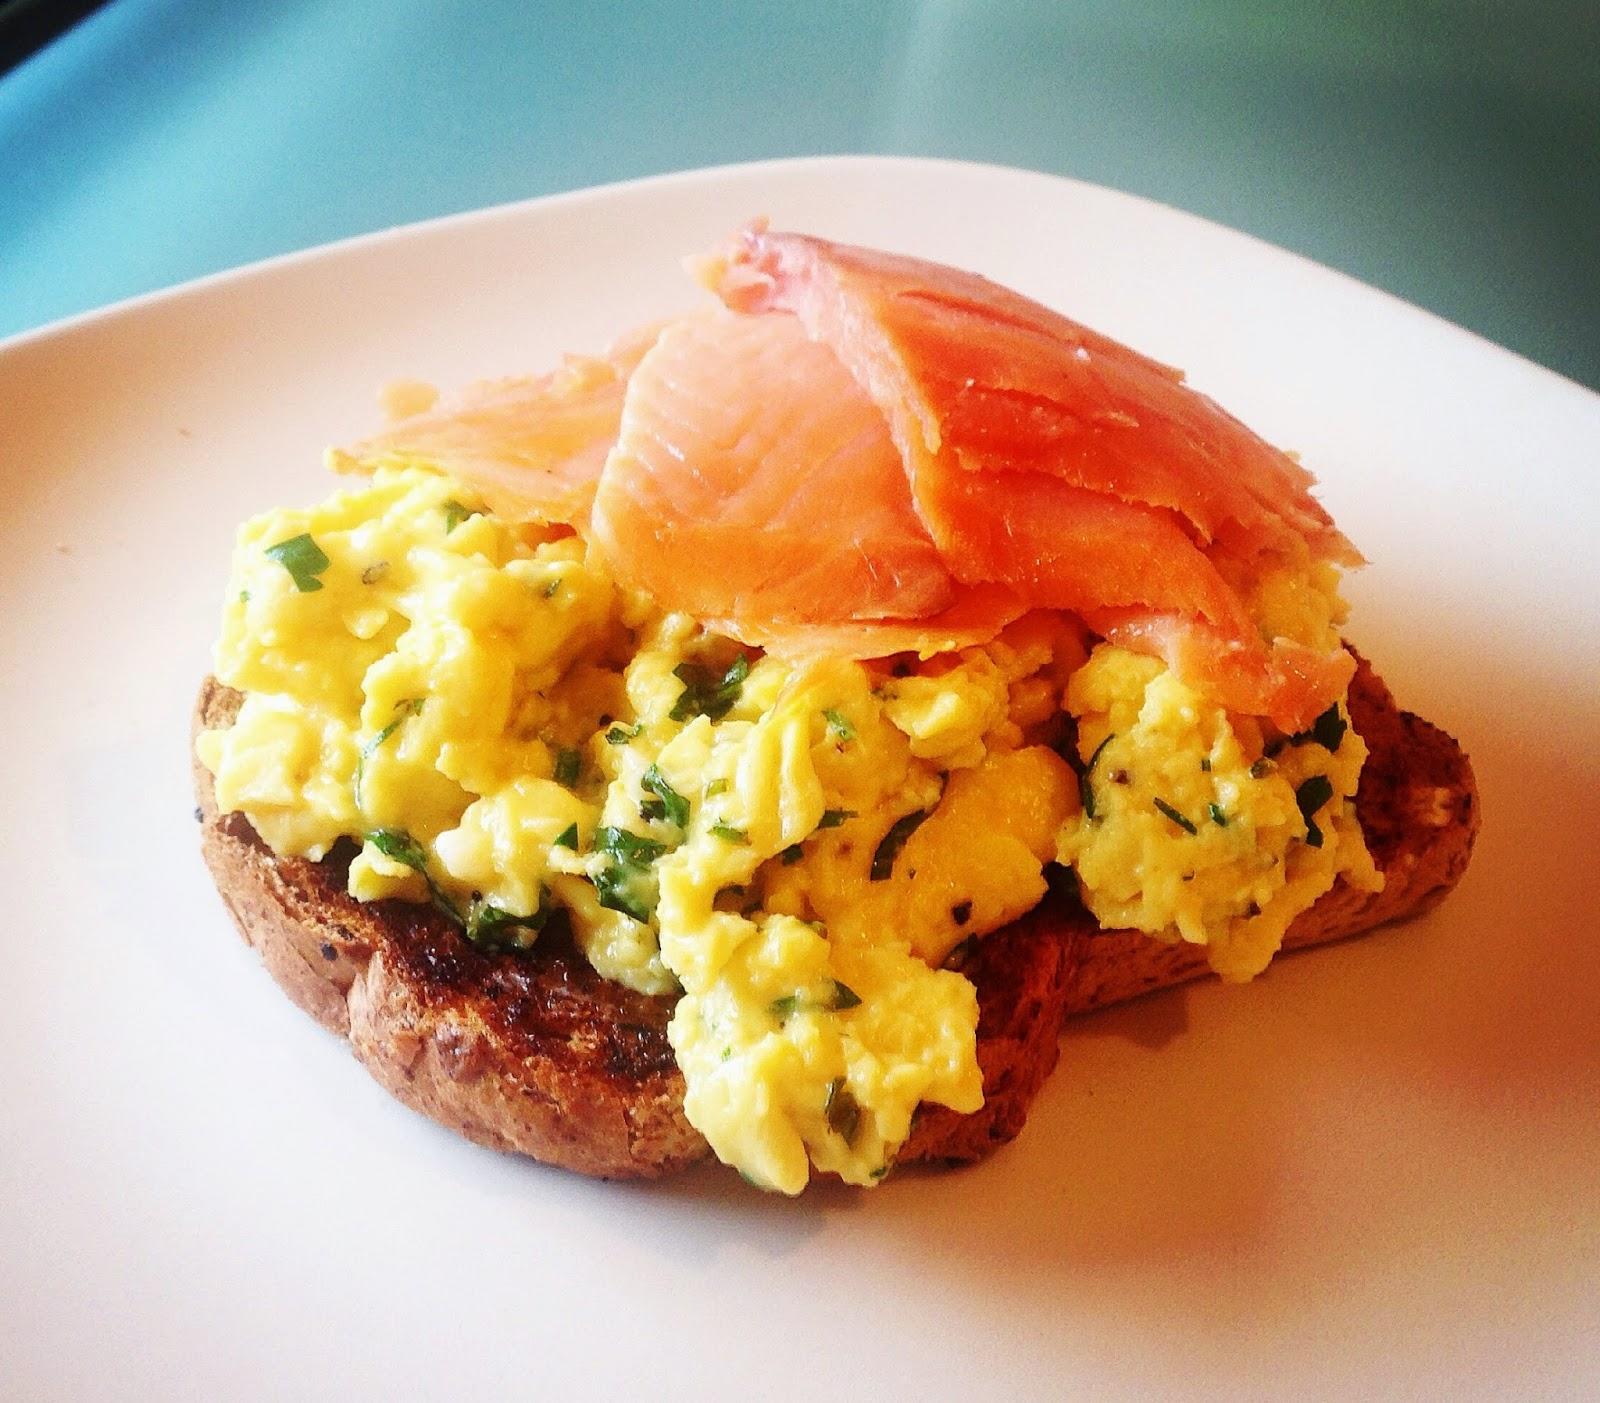 Smoked salmon deviled eggs recipes - smoked salmon deviled eggs recipe